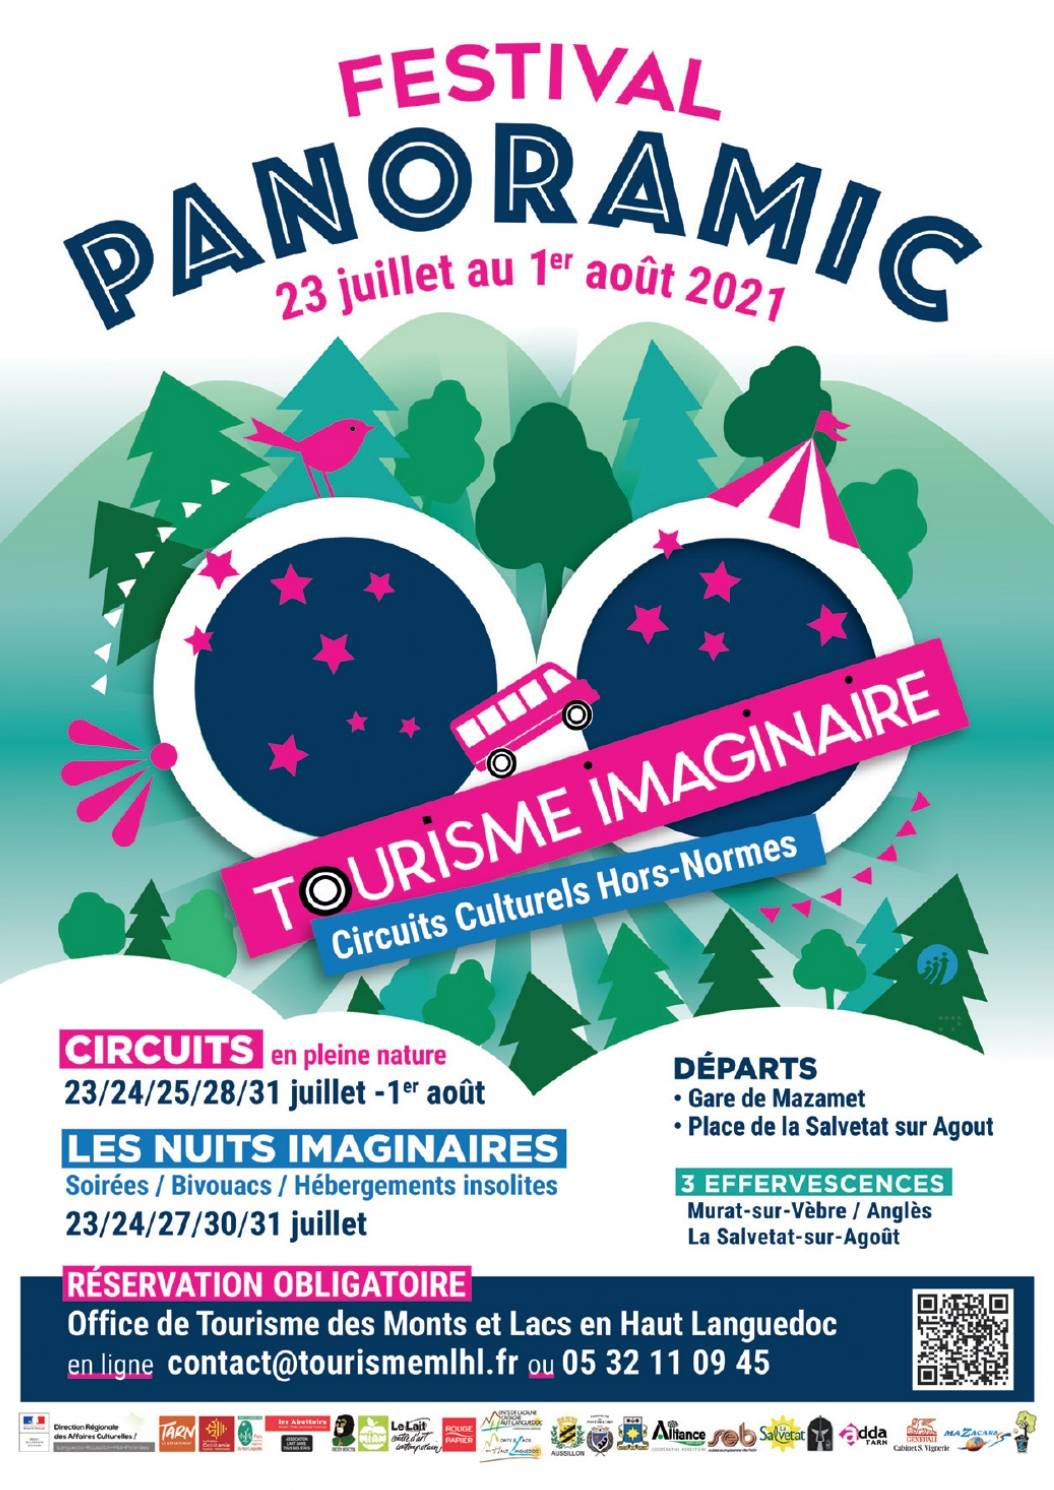 Tourisme imaginaire - Festival Panoramic 1 Juin 2021